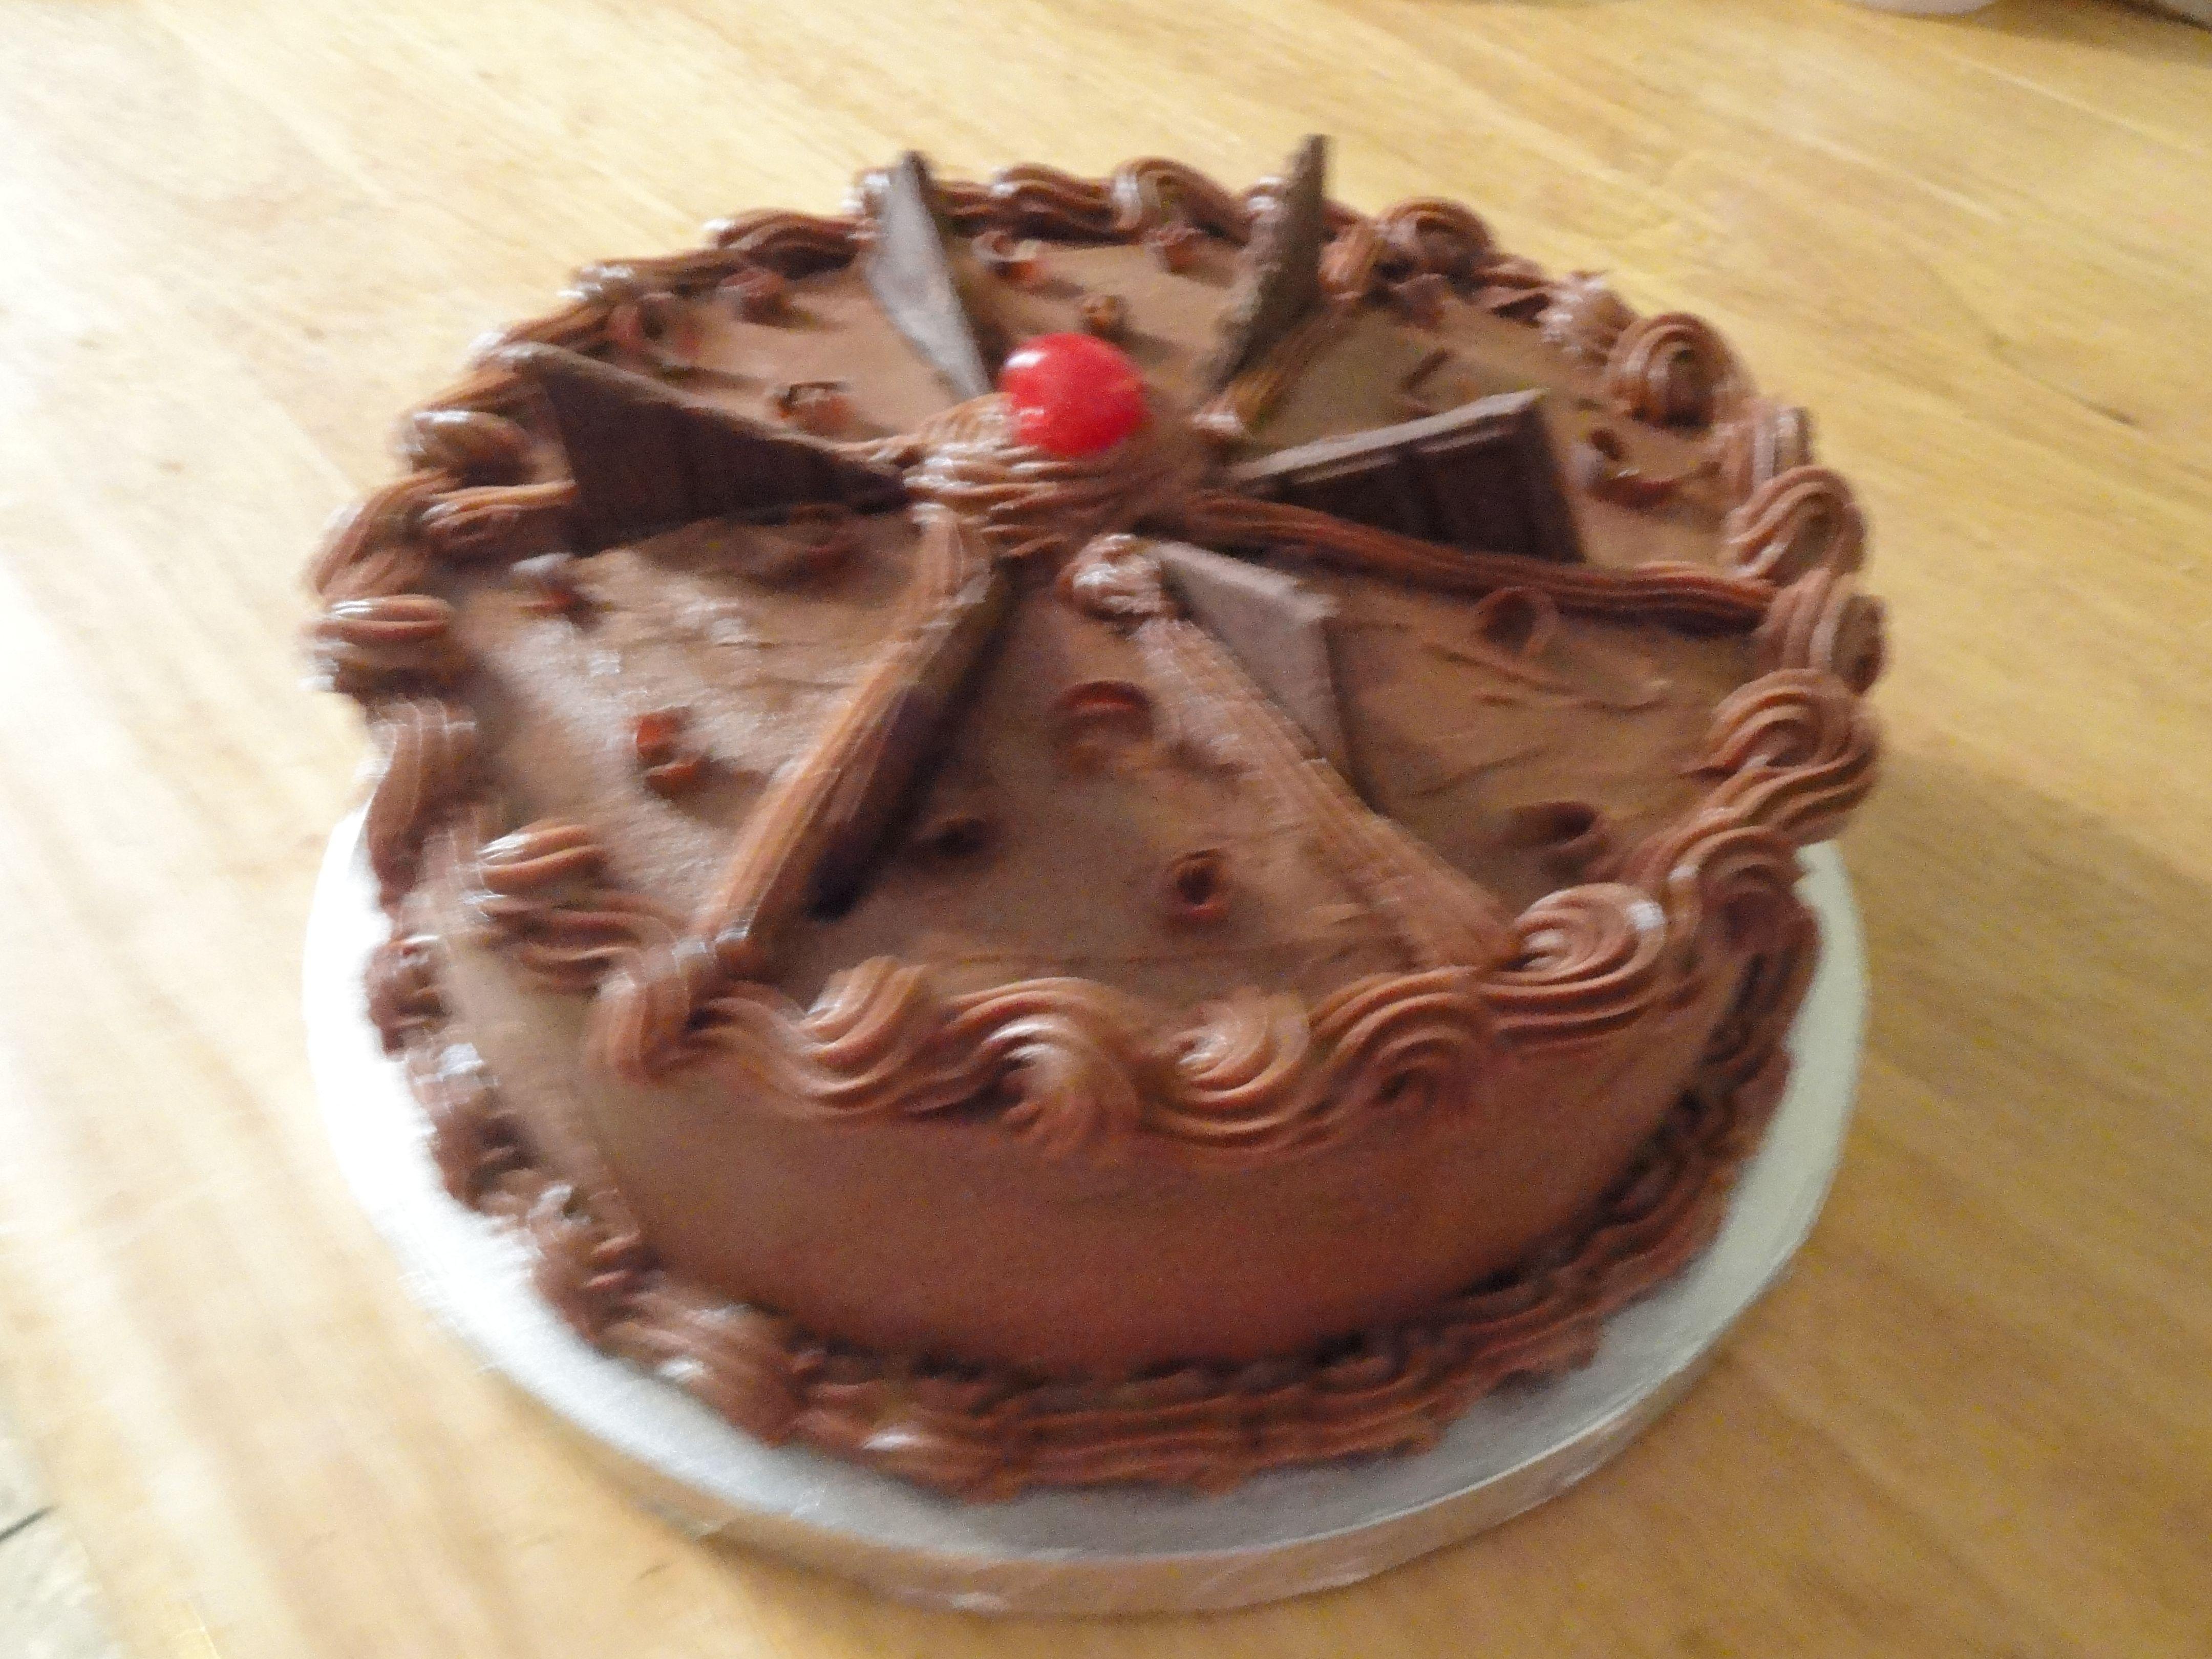 Chocolate Cake Decorating Ideas Pinterest : Chocolate Cake Cakes/Cake Decorating Pinterest